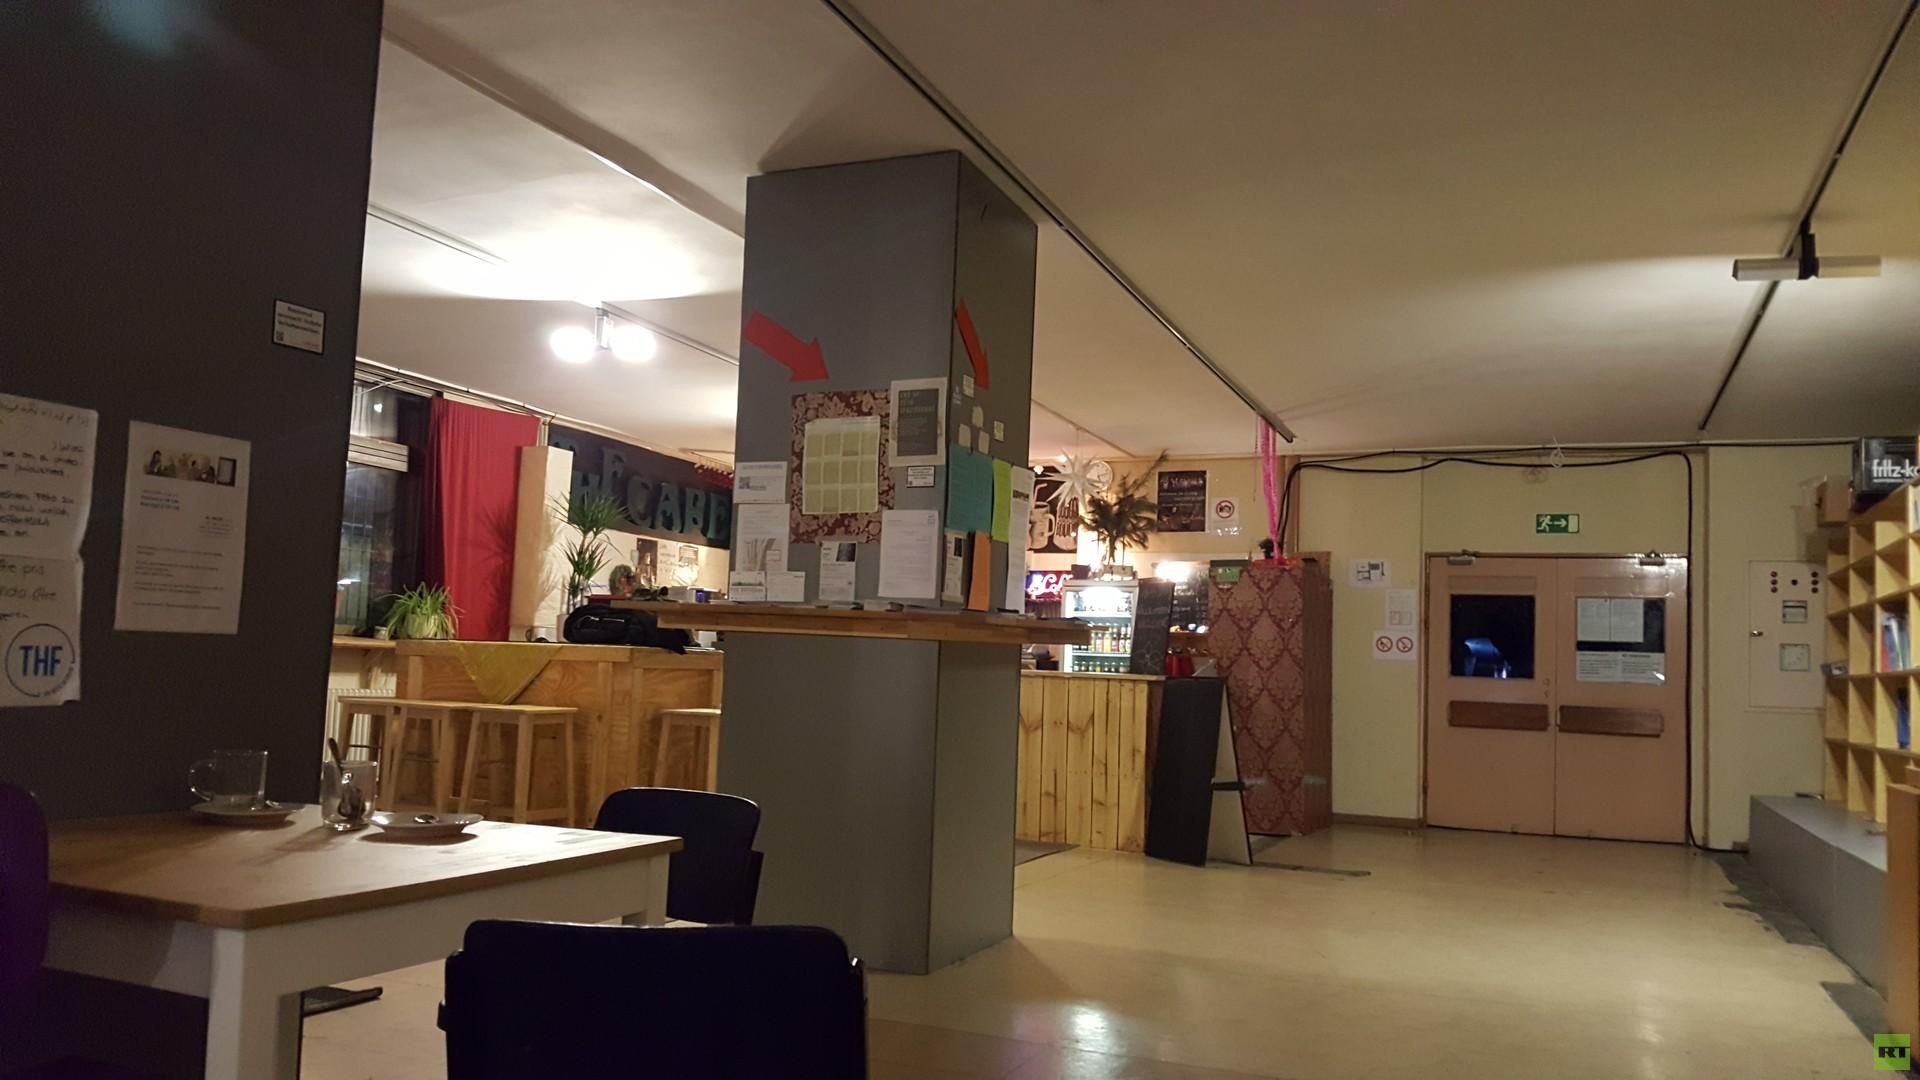 Flüchtlings-Hot-Spot Berlin-Tempelhof: RT Deutsch im Gespräch mit den Menschen vor Ort